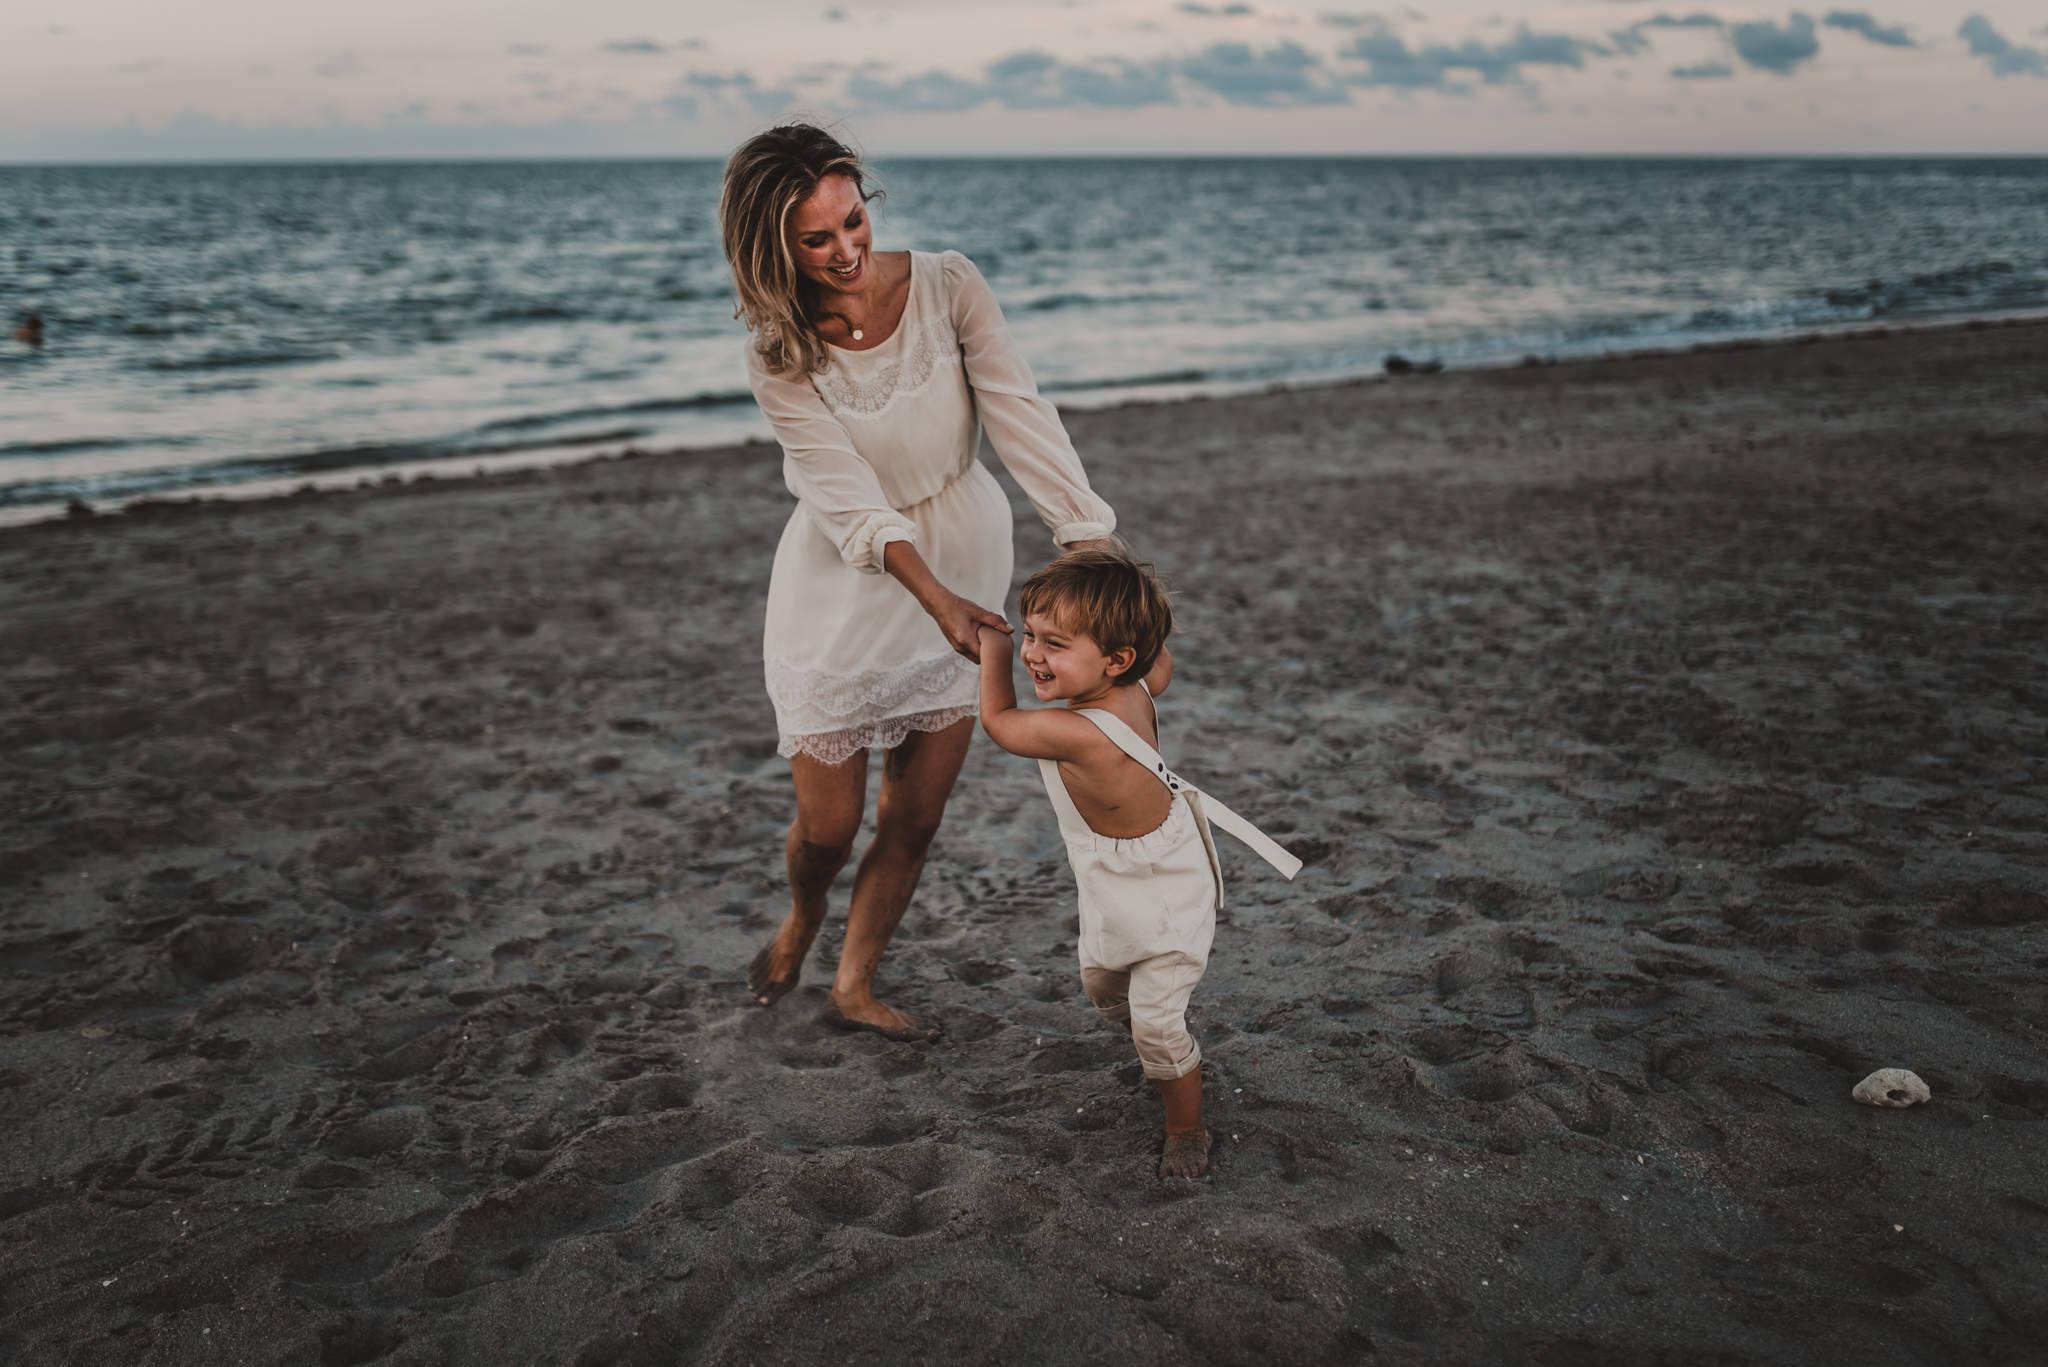 twyla jones photography - treasure coast florida - mother son at the beach--26.jpg